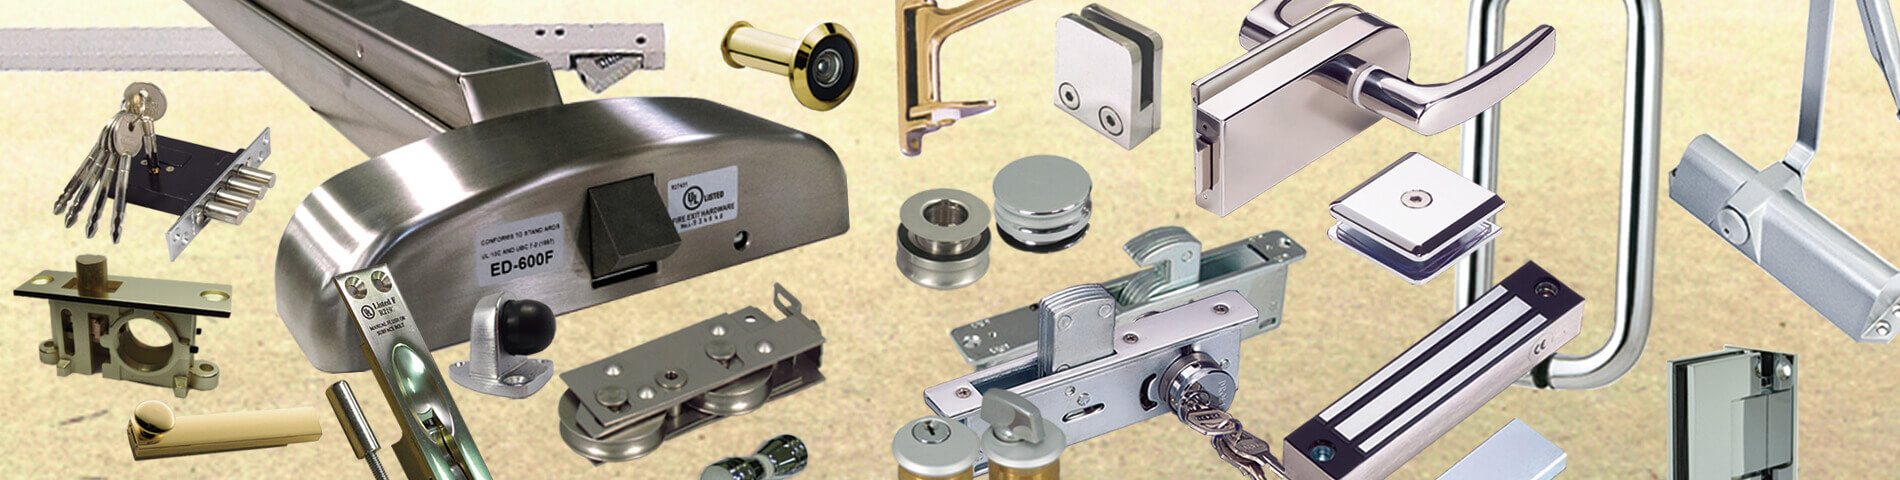 Building Hardware Supplier